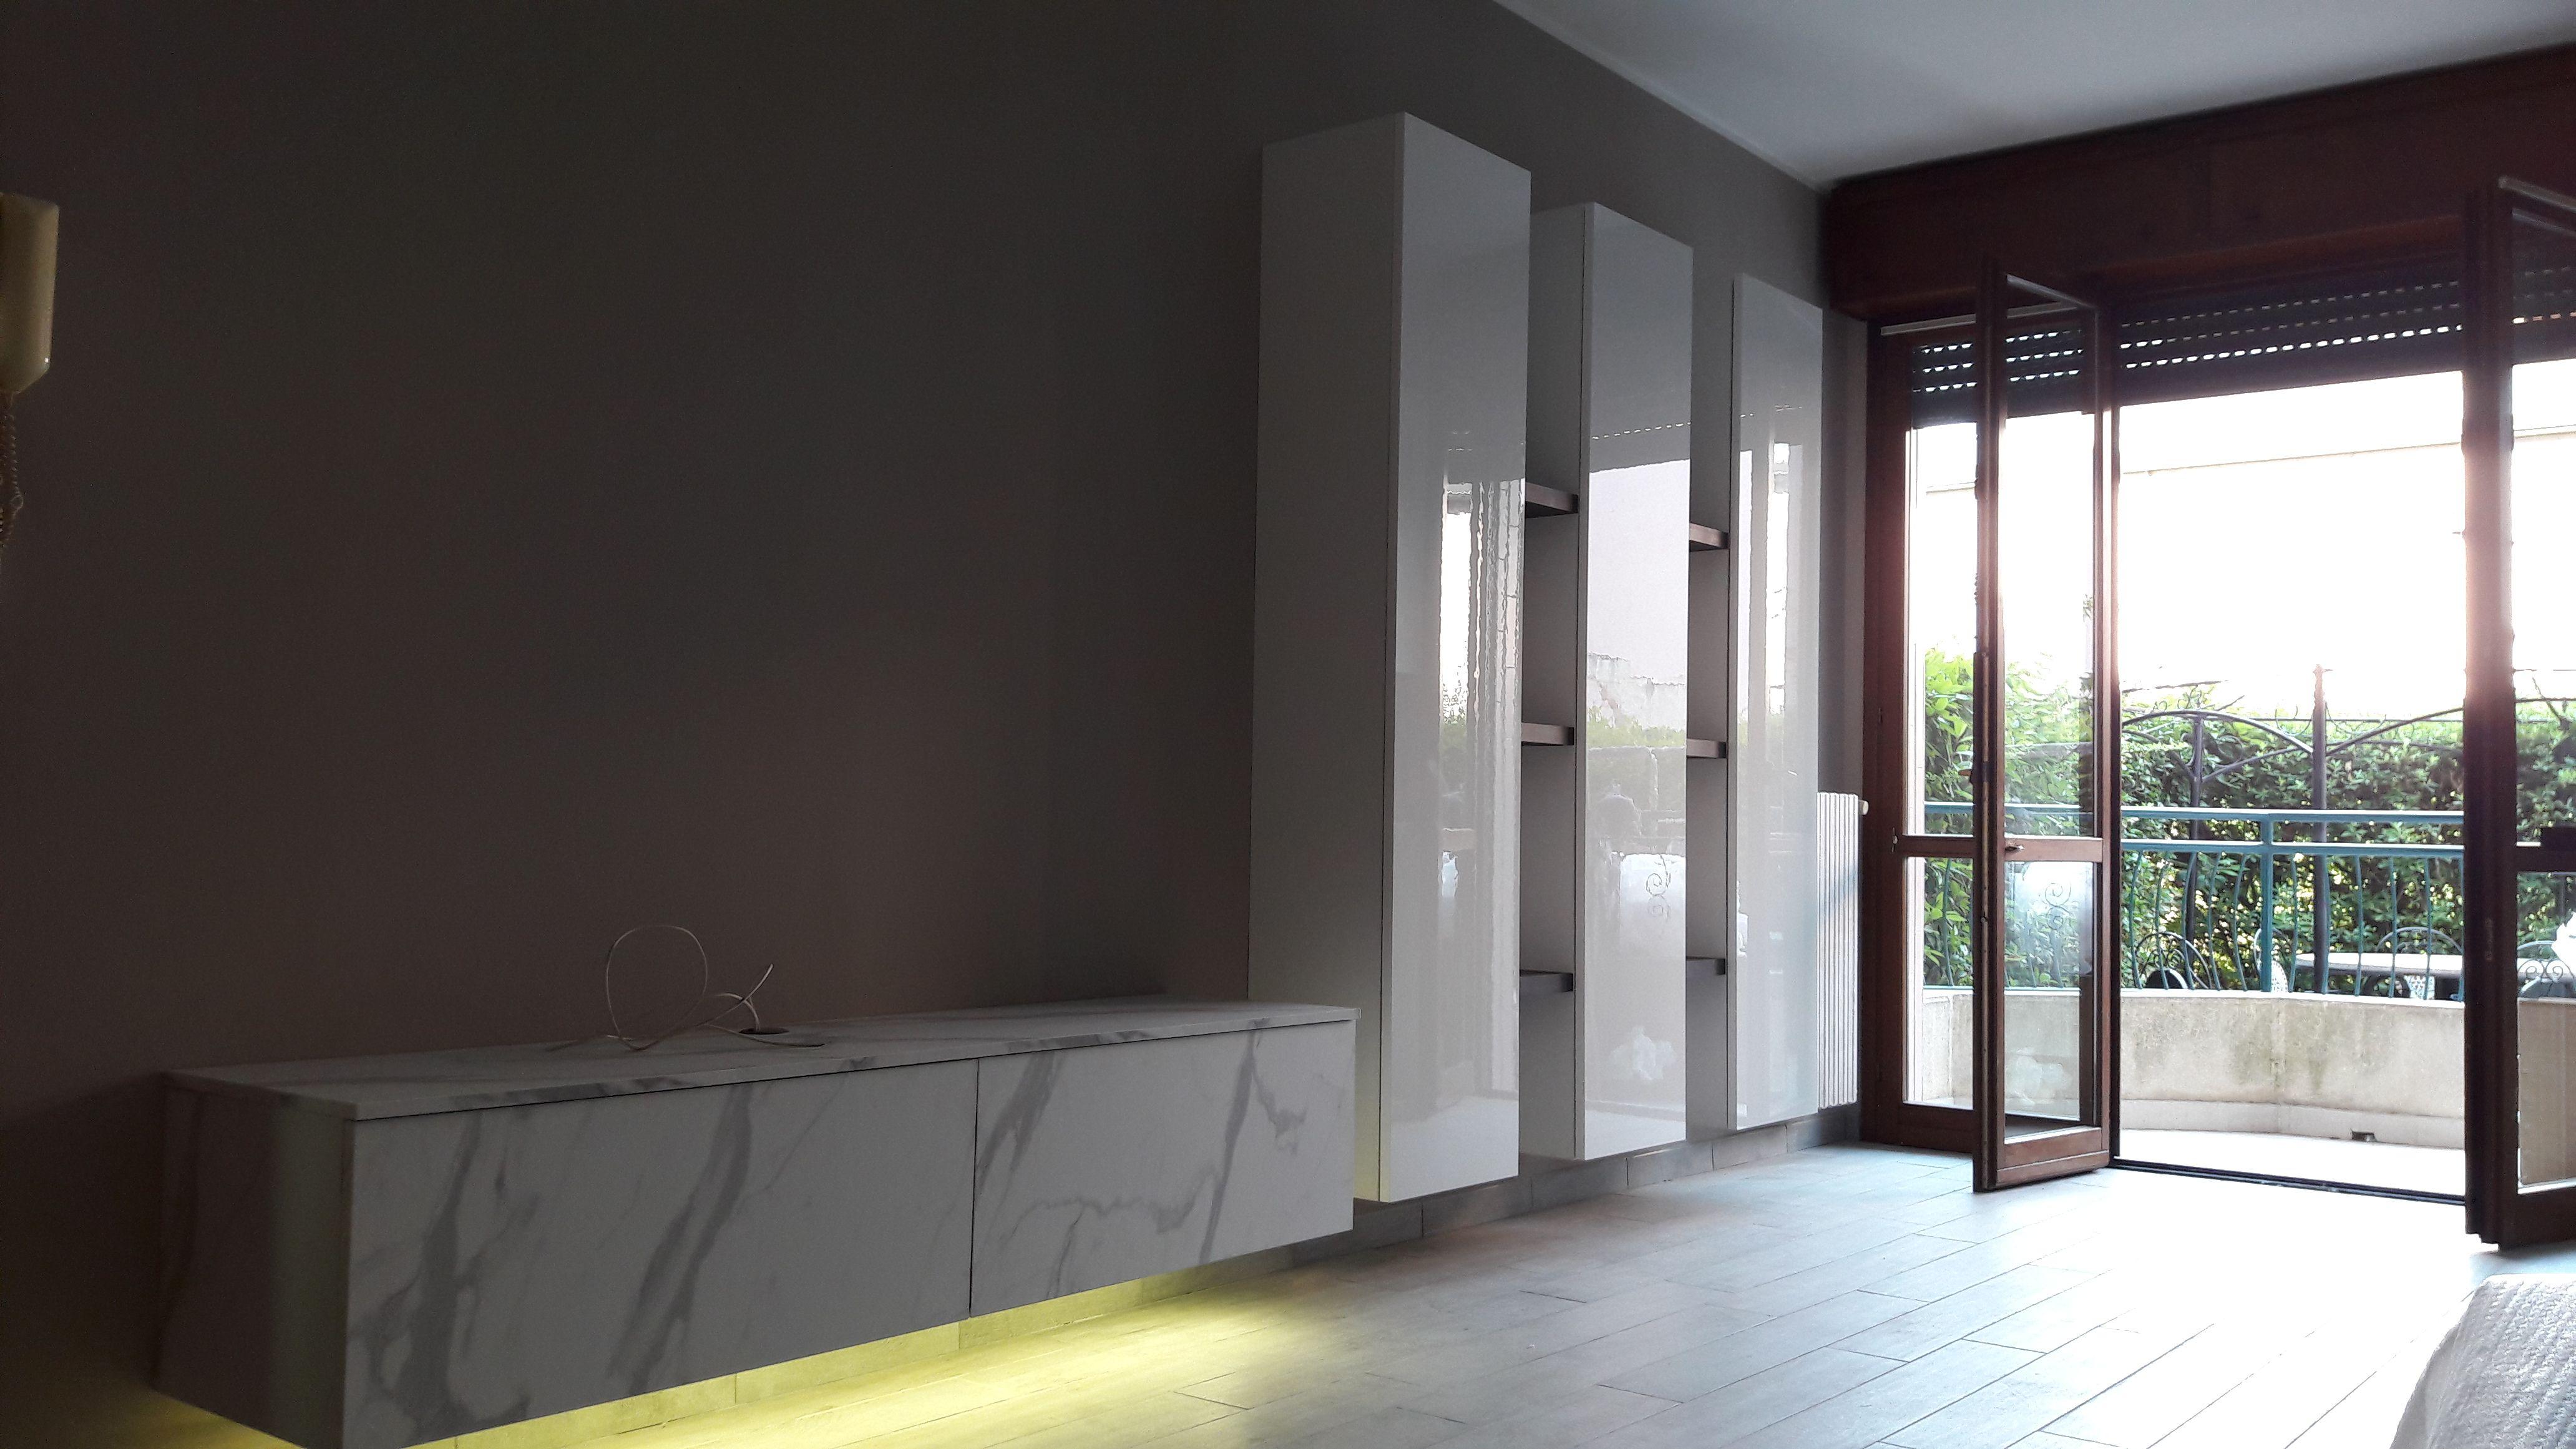 Soggiorno Minimal ~ 7 best mobili soggiorno images on pinterest minimal modern and